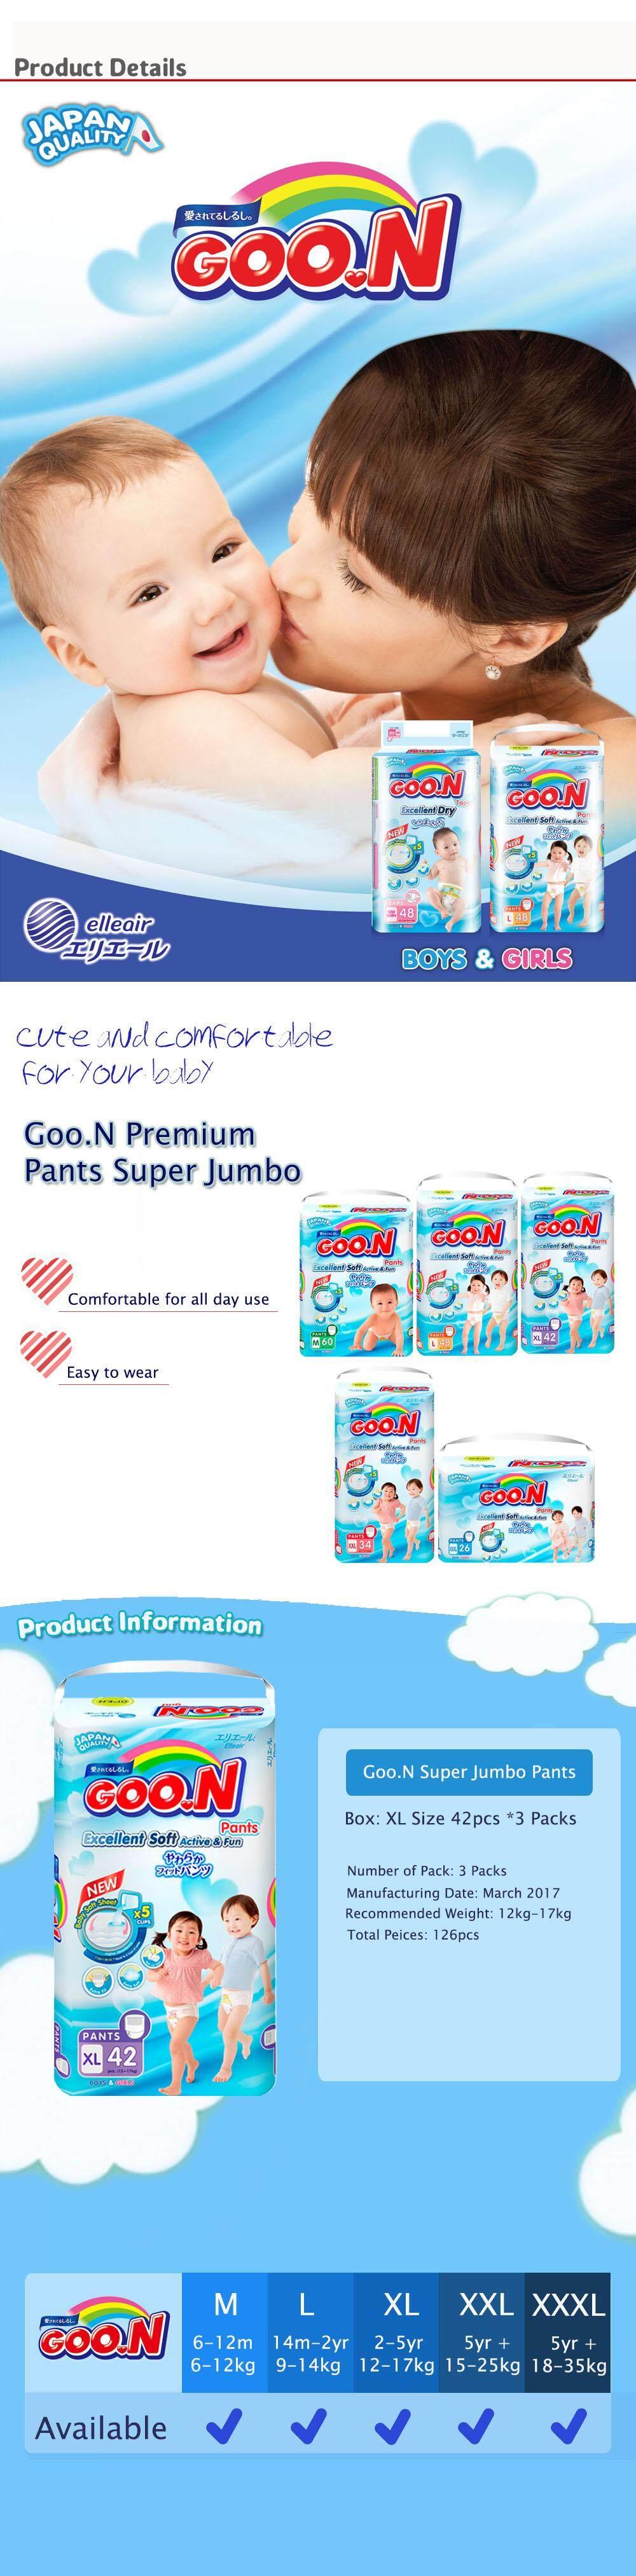 Goo N Diaper Pants Excellent Soft Active Xl22 Spec Dan Daftar Goon Dry Premium Tape Super Jumbo Xl Isi 50 Size 42pcs X3 Pack